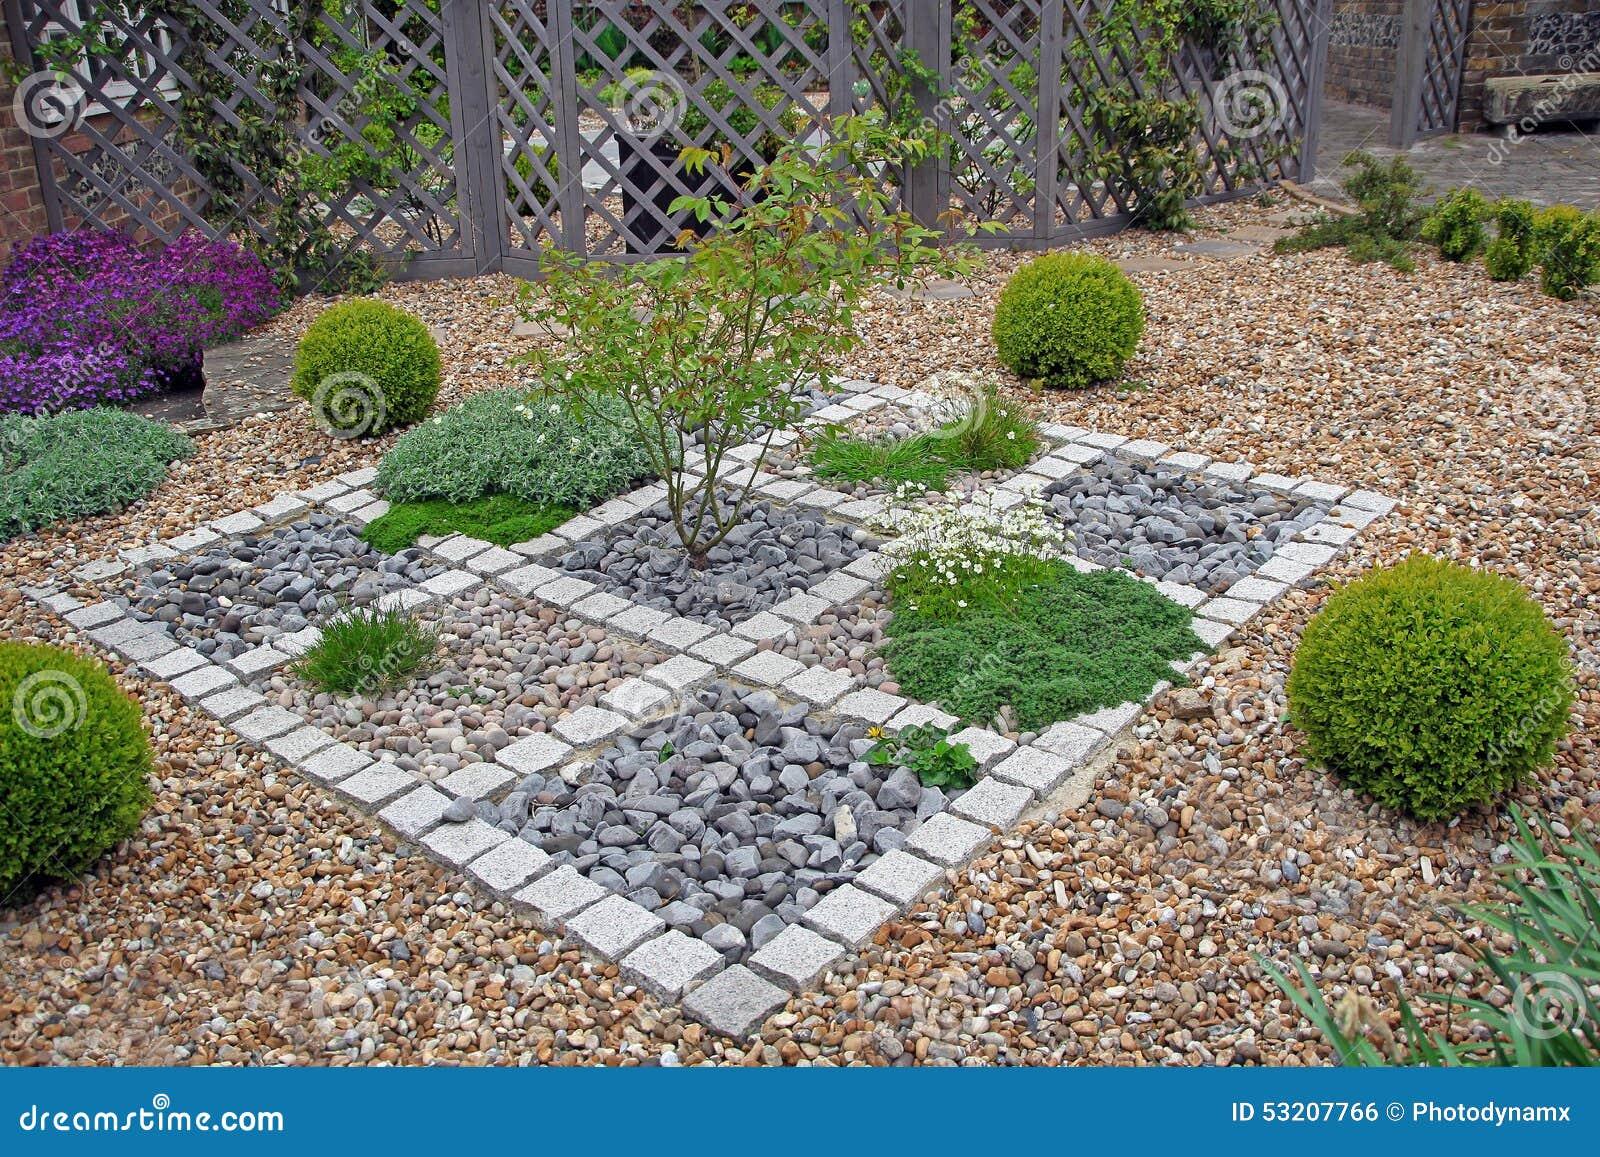 Ornate Zen Garden Stock Photo Image Of House Topiary